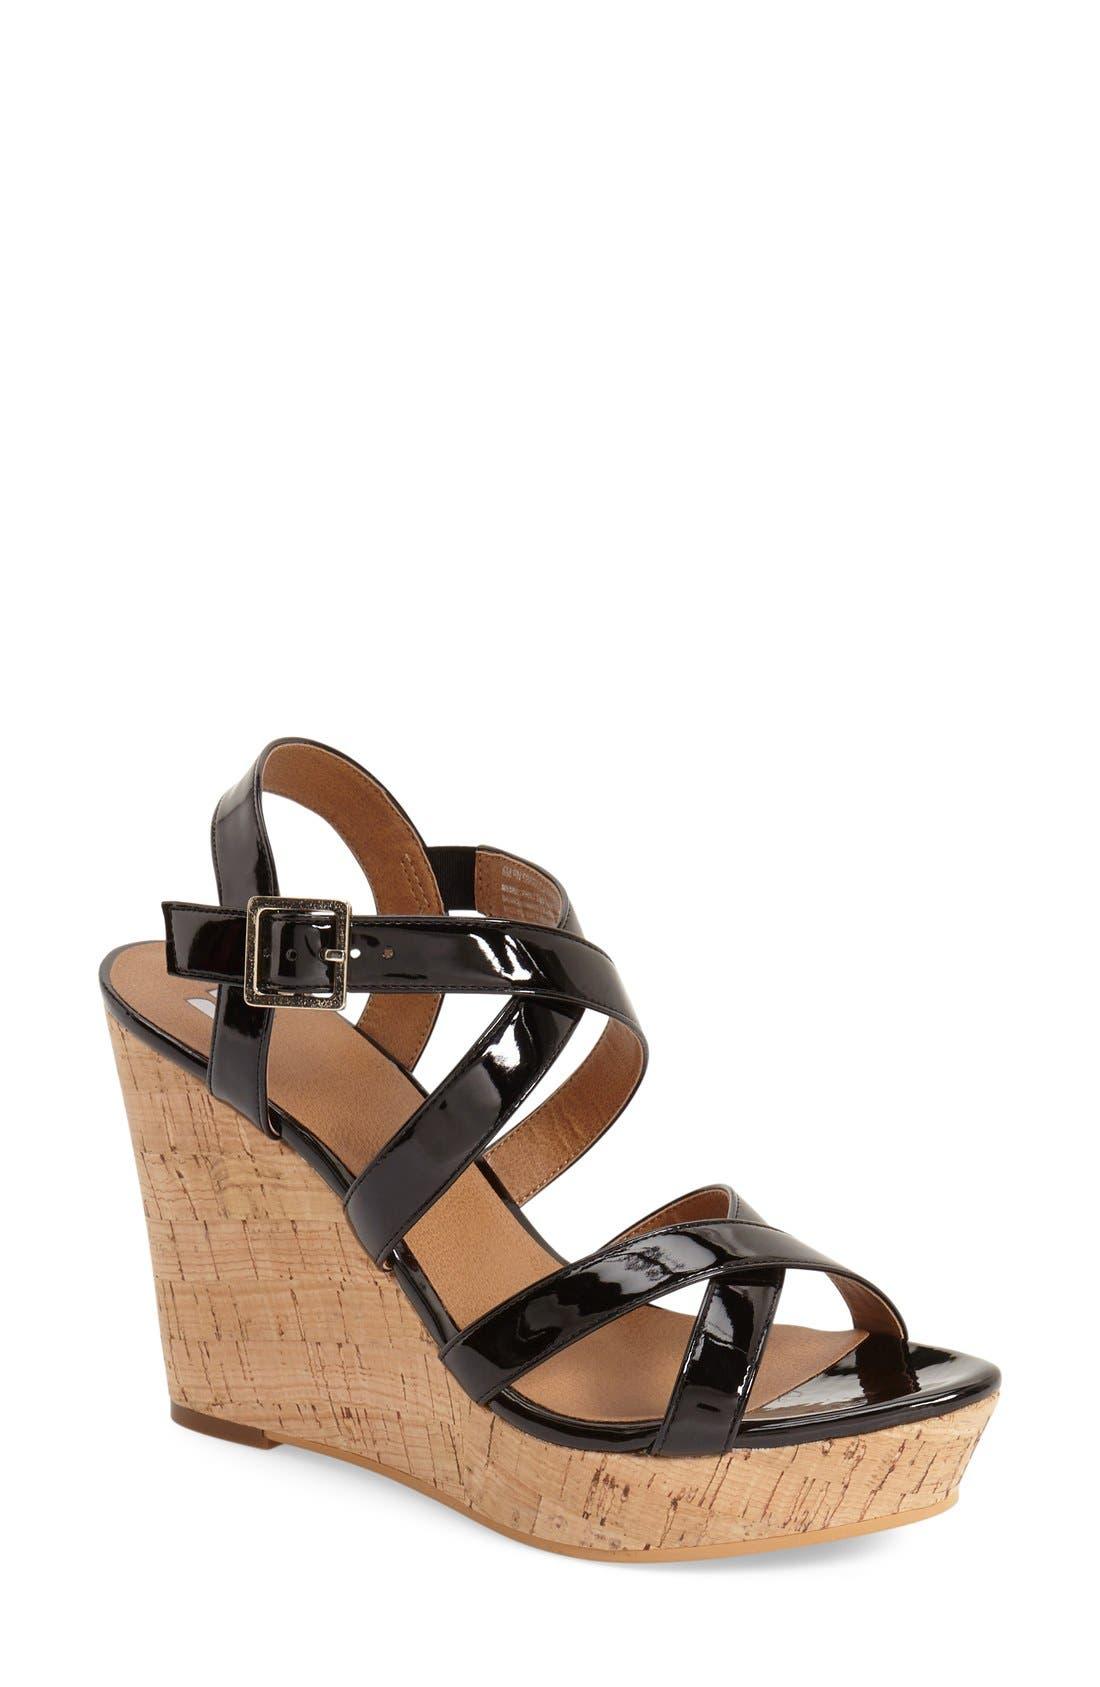 'Summers' Wedge Sandal,                             Main thumbnail 1, color,                             003